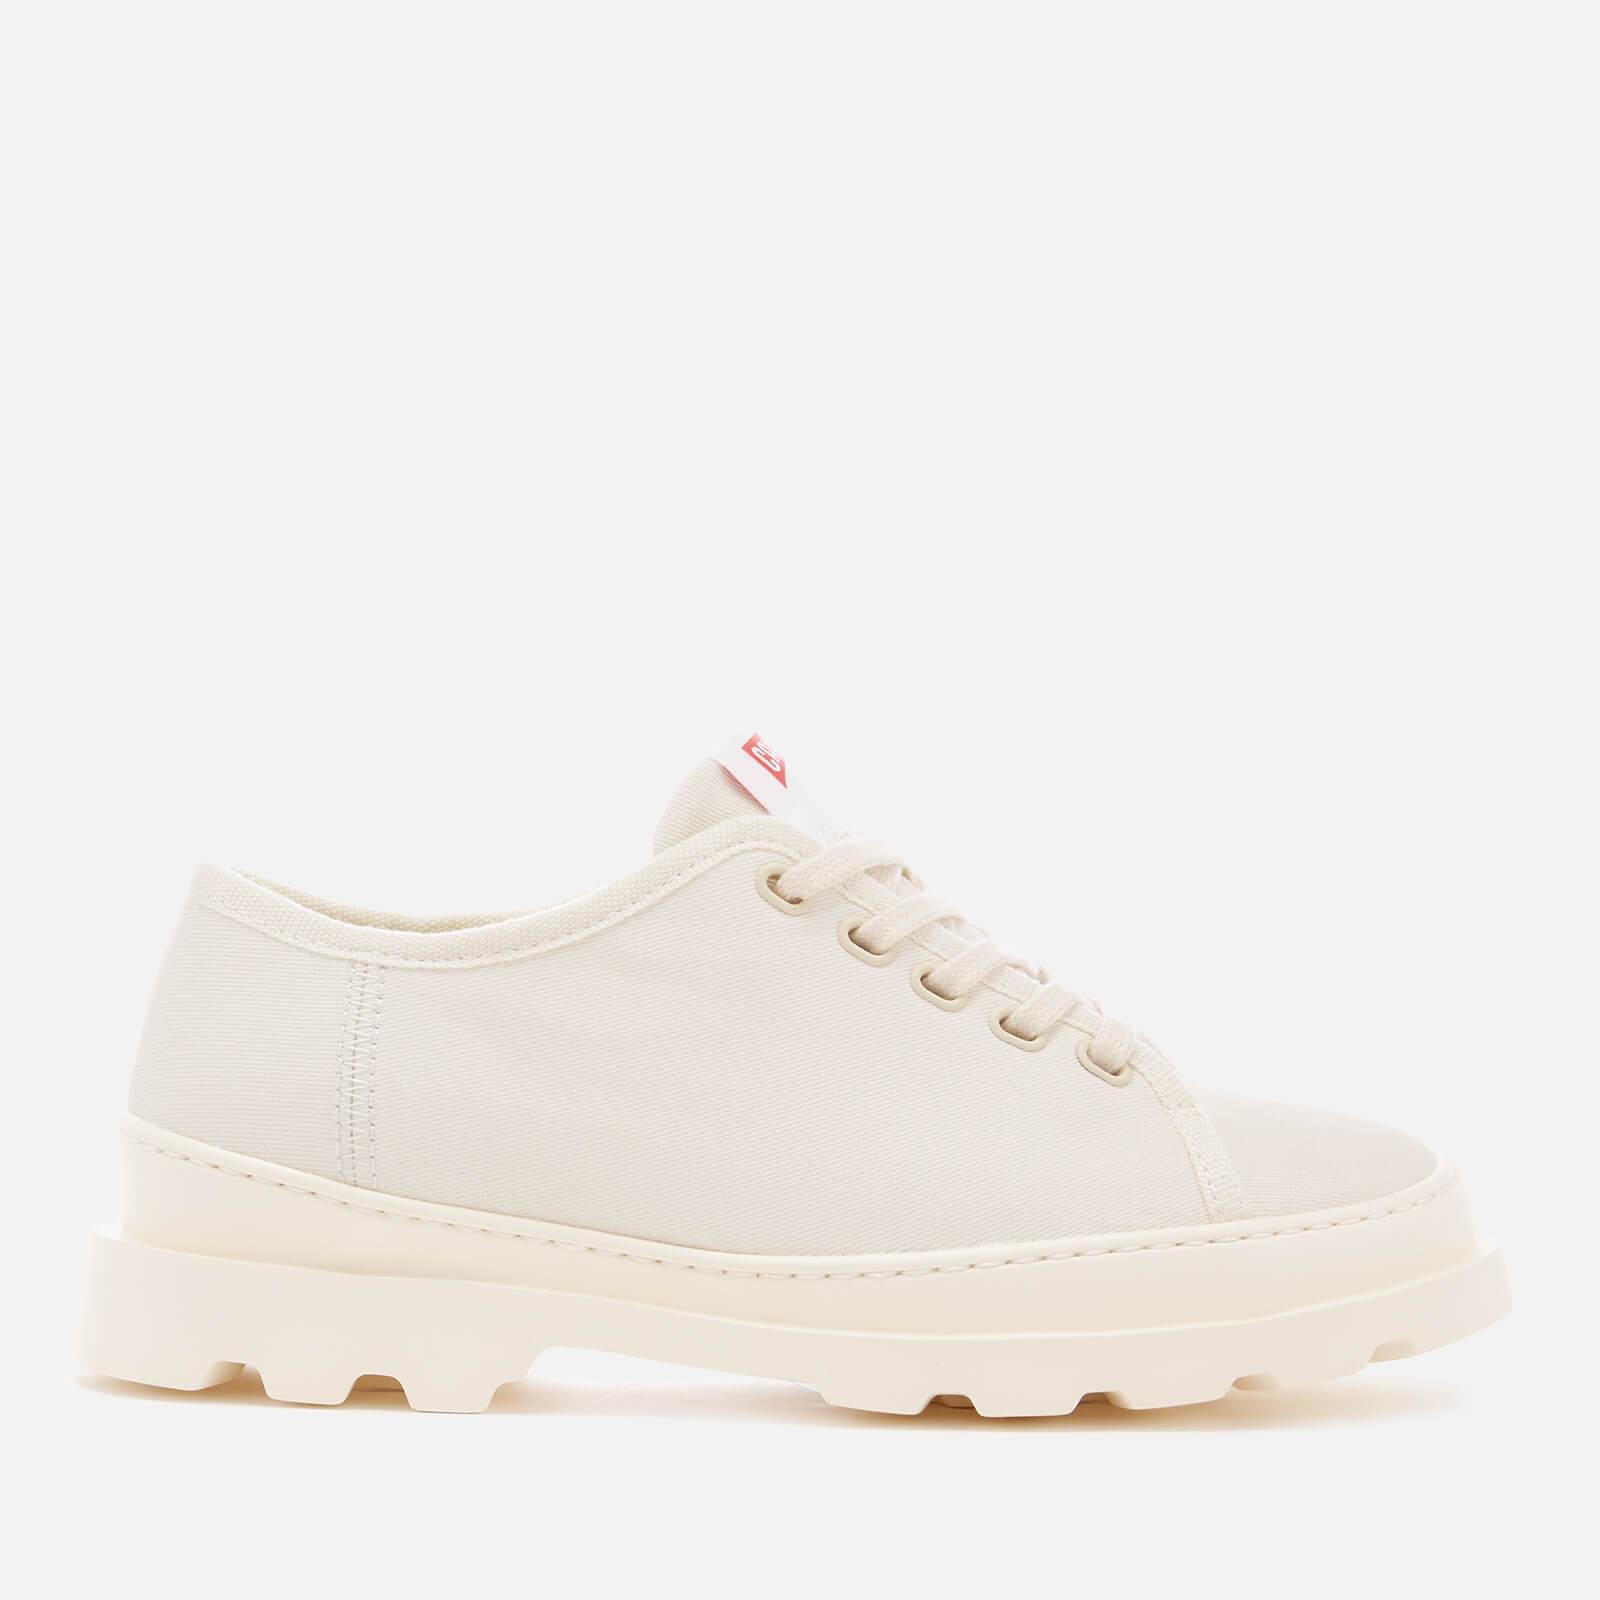 Camper Women's Brutus Canvas Shoes - Light Beige - UK 5 - Beige